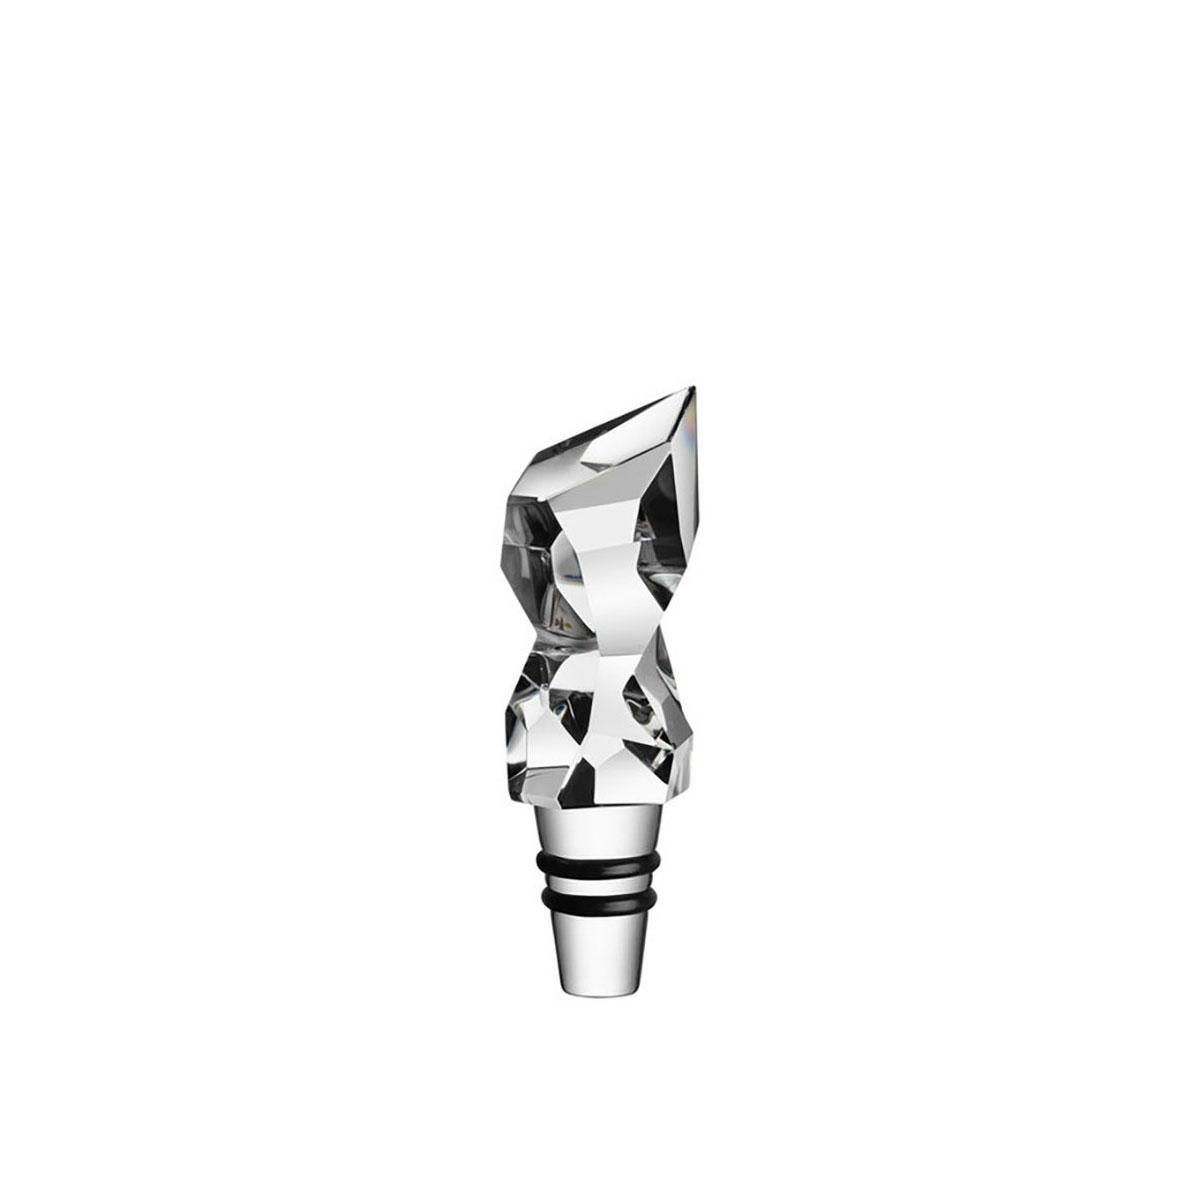 Orrefors Crystal, Carat Tokyo Wine Bottle Stopper, Single